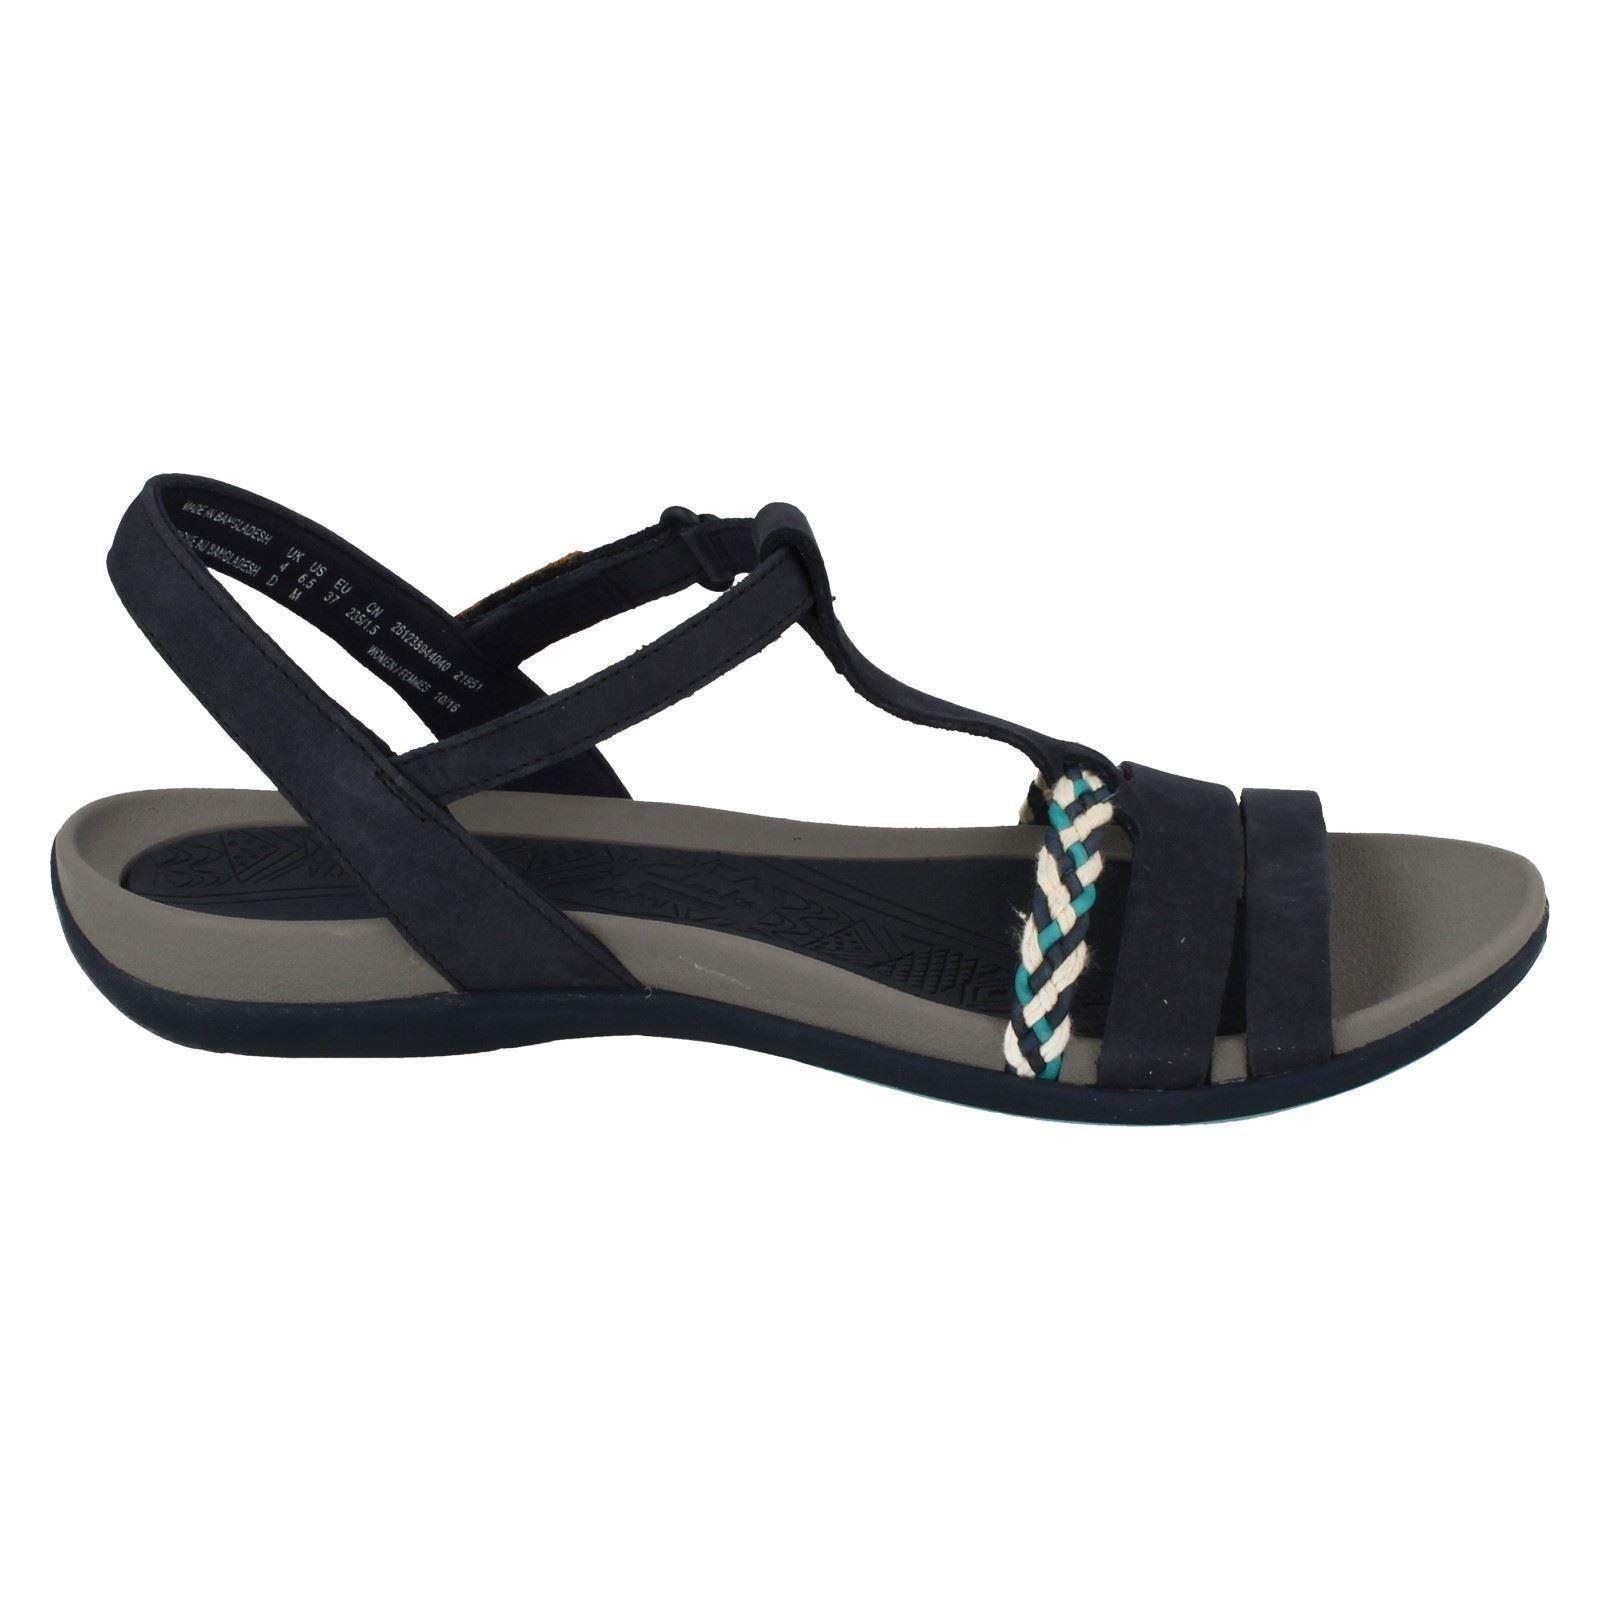 5a68bcf6f48f Ladies-Clarks-Casual-Summer-Sandals-Tealite-Grace thumbnail 23